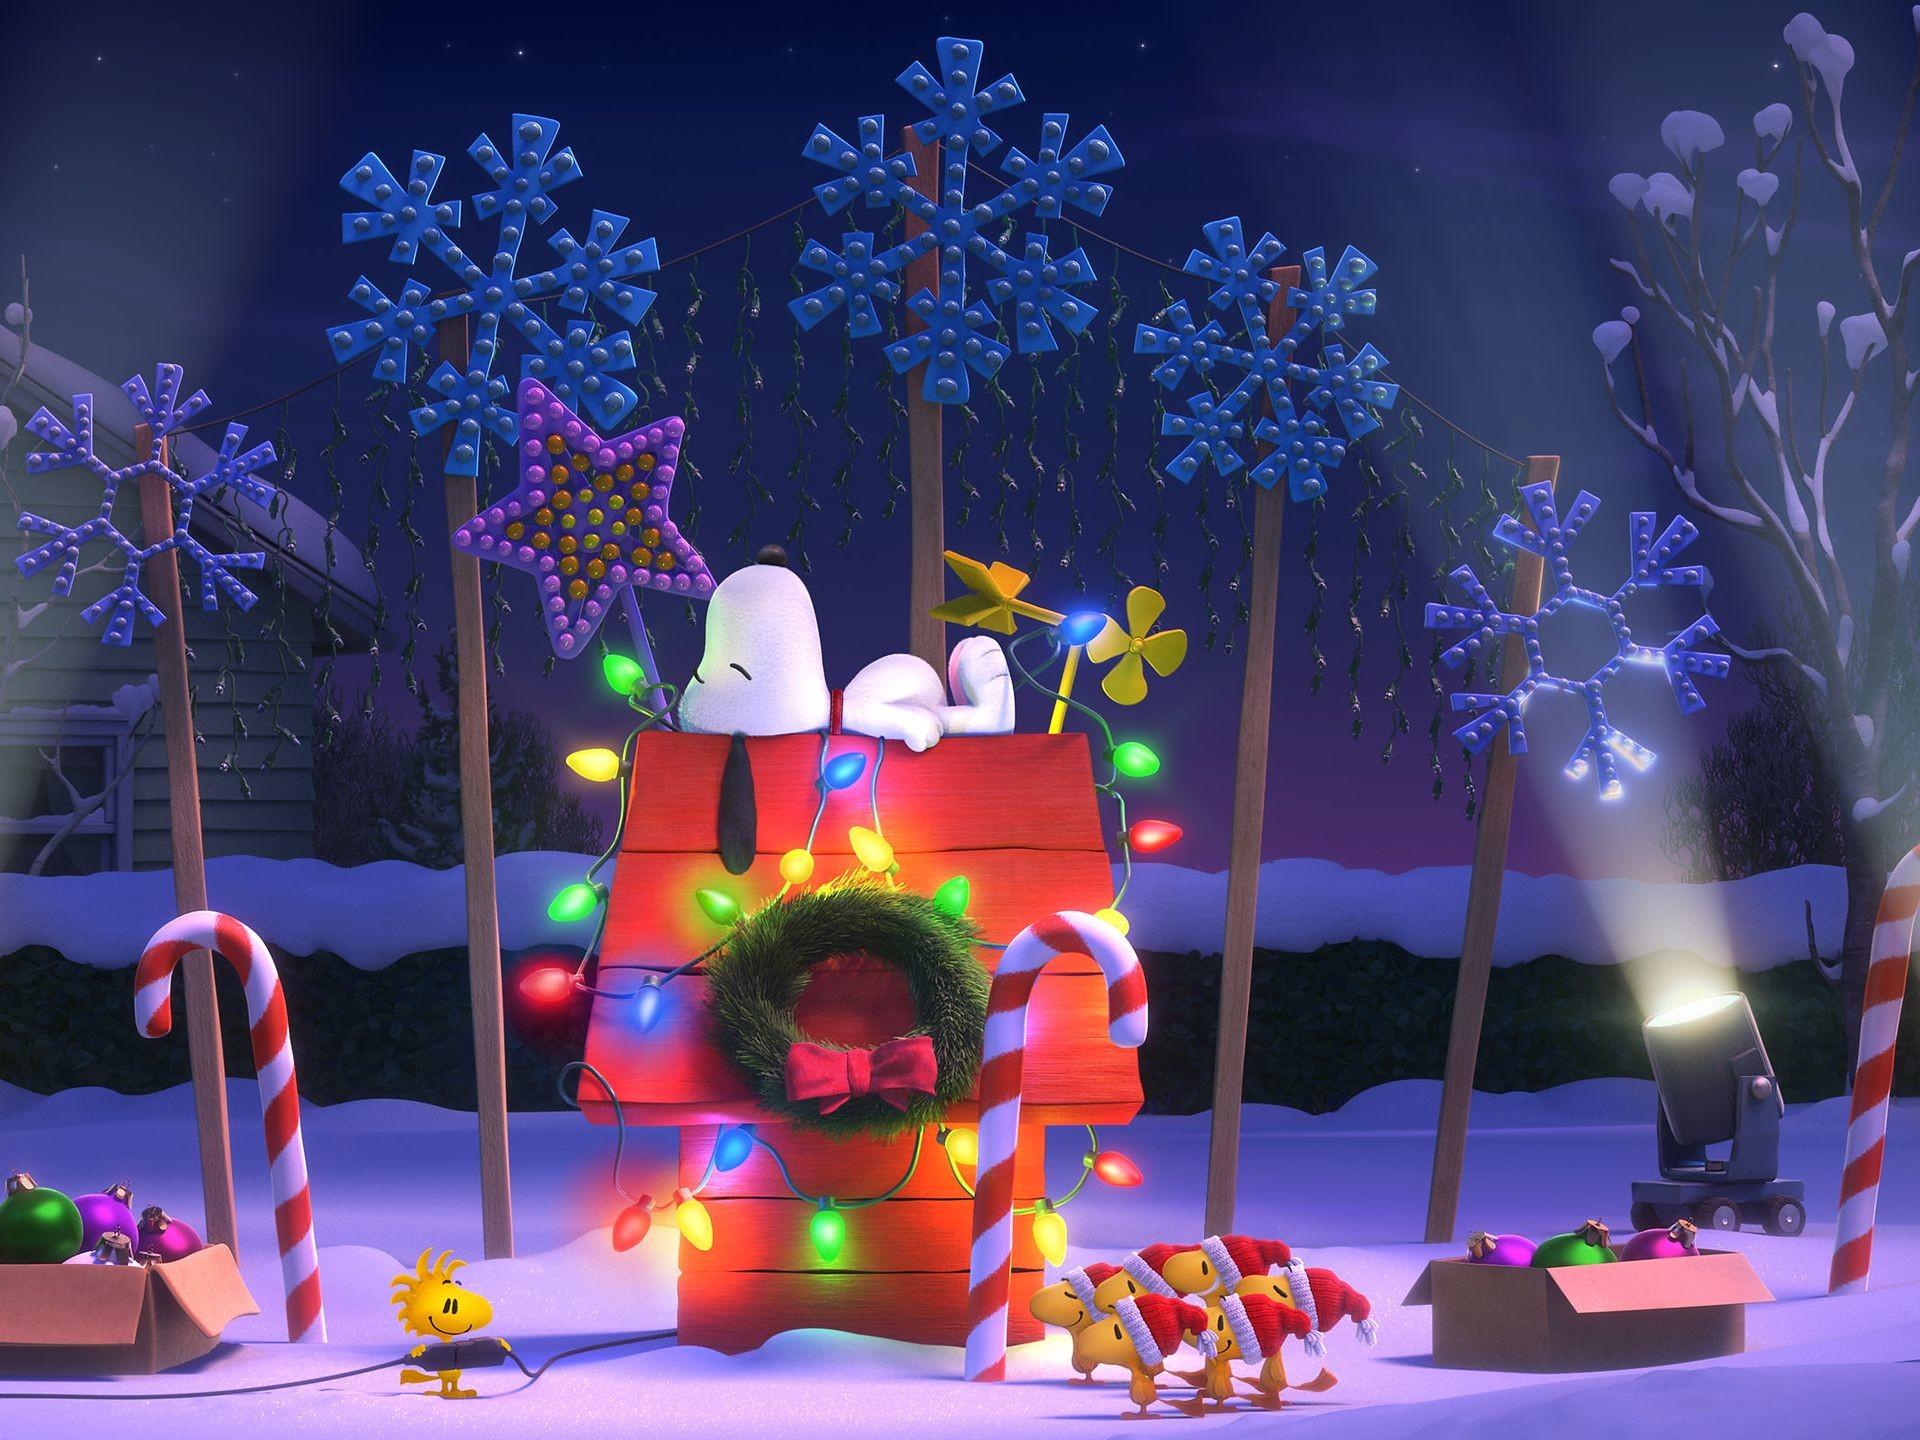 Christmas Ipad Wallpapers: Snoopy Christmas Backgrounds ·① WallpaperTag